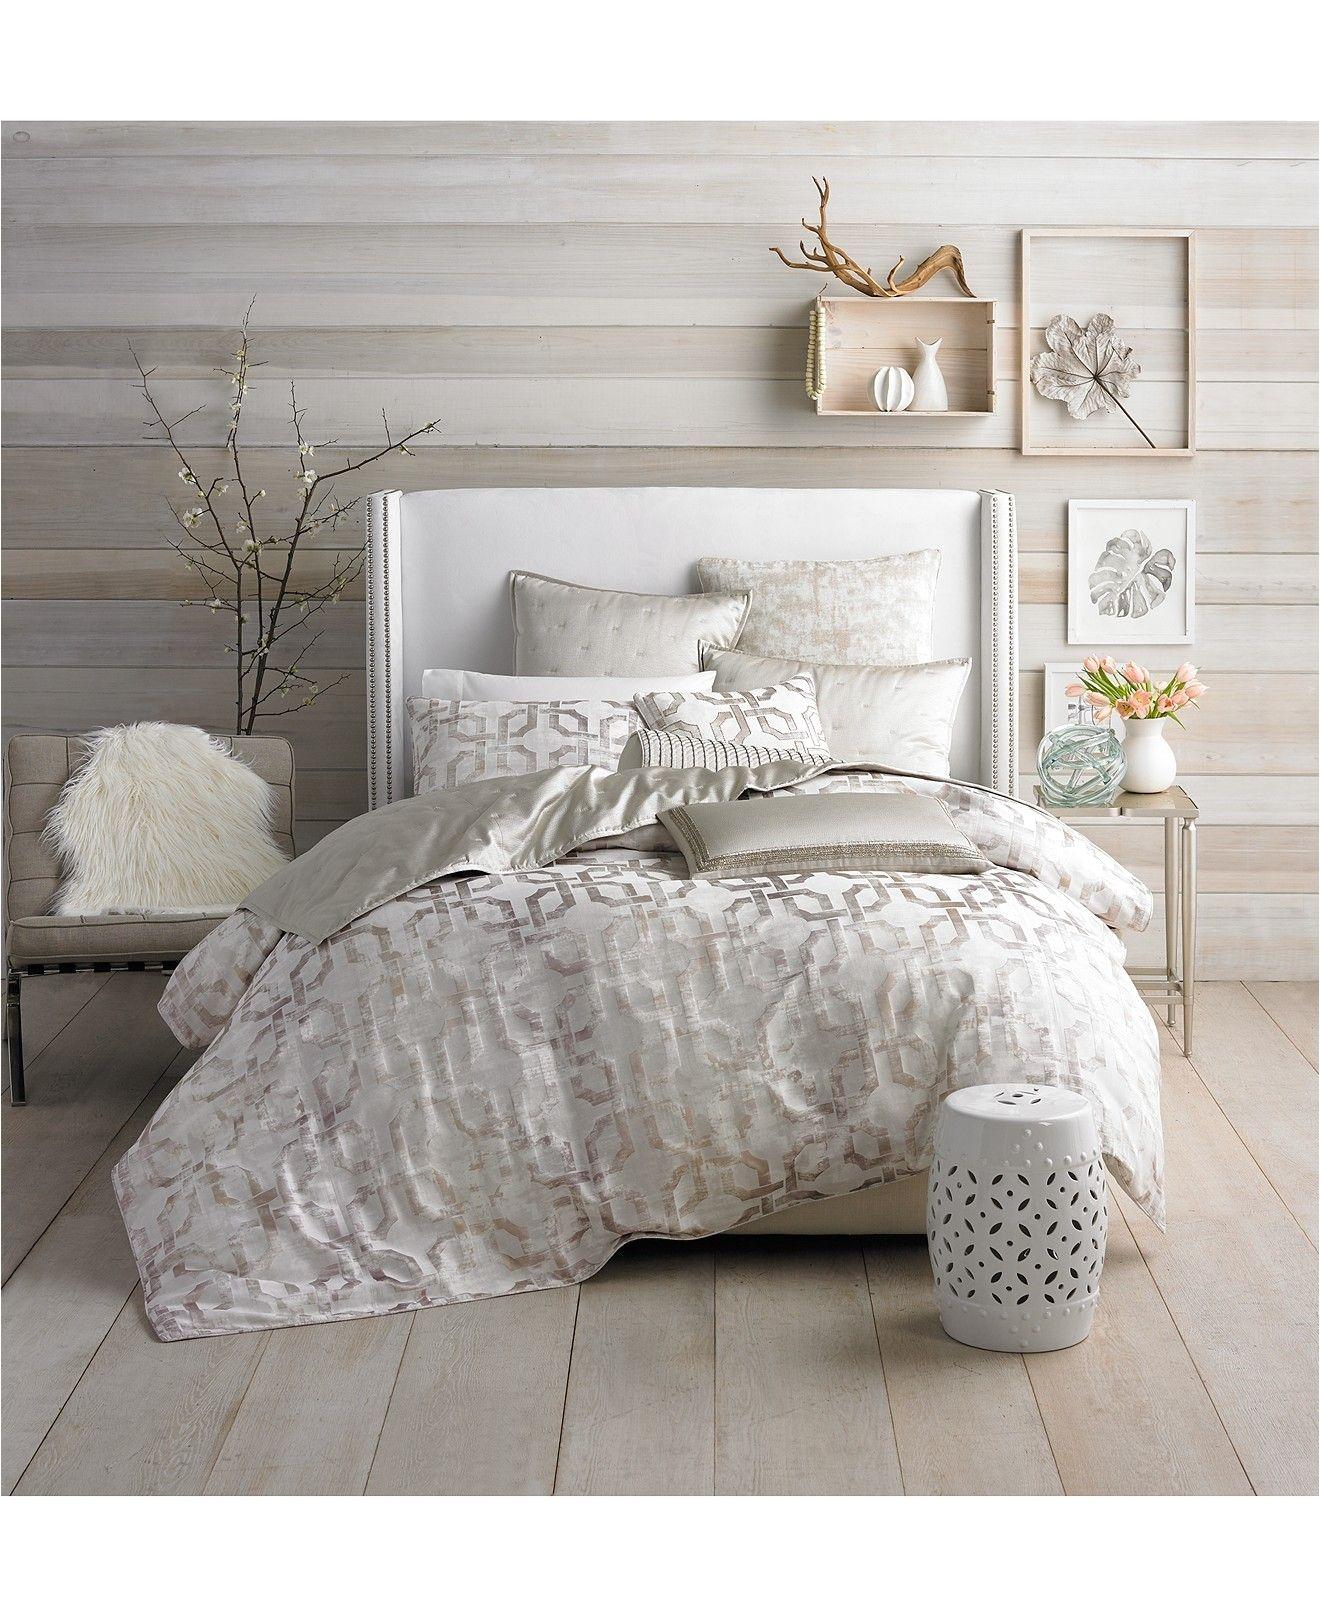 hotel collection fresco bedding collection only at macy s hotel collection bed bath macy s